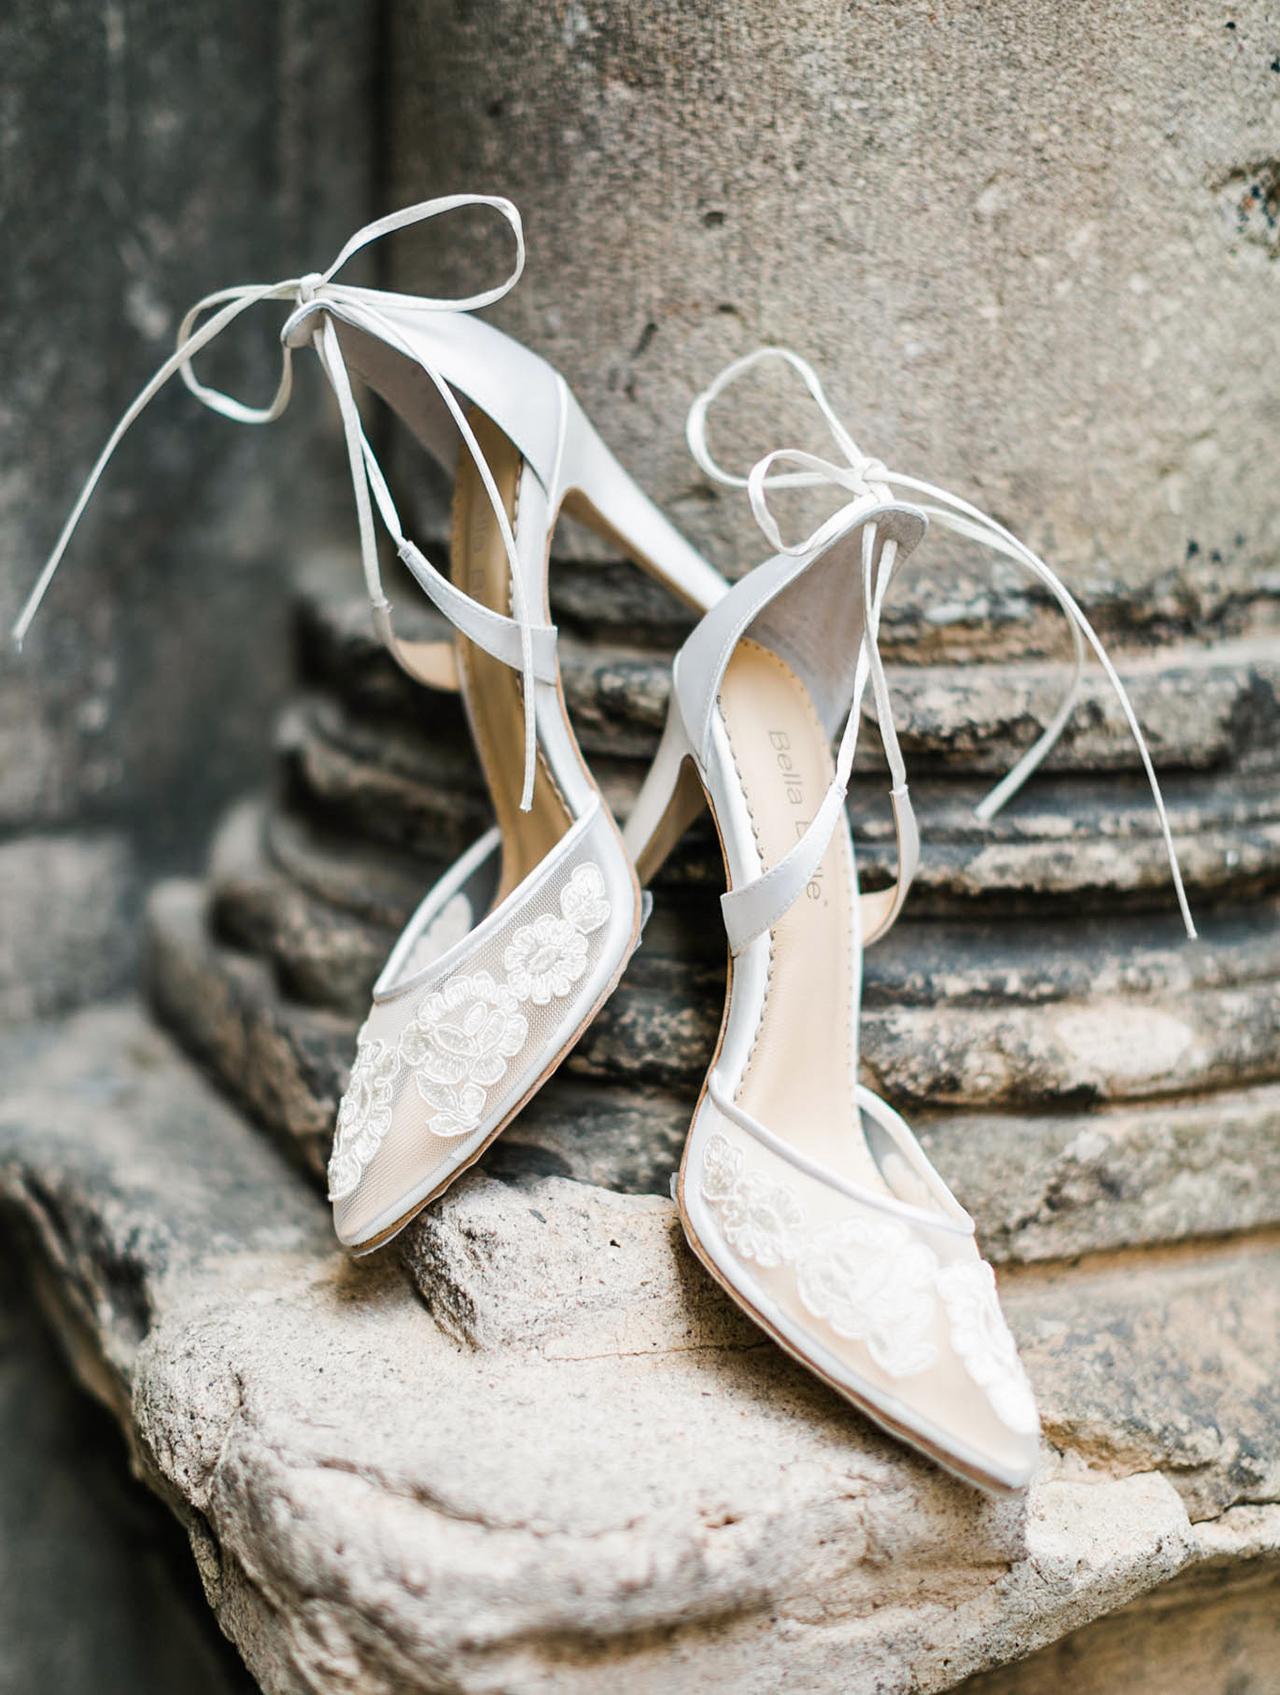 brides white chanel sling backs shoes